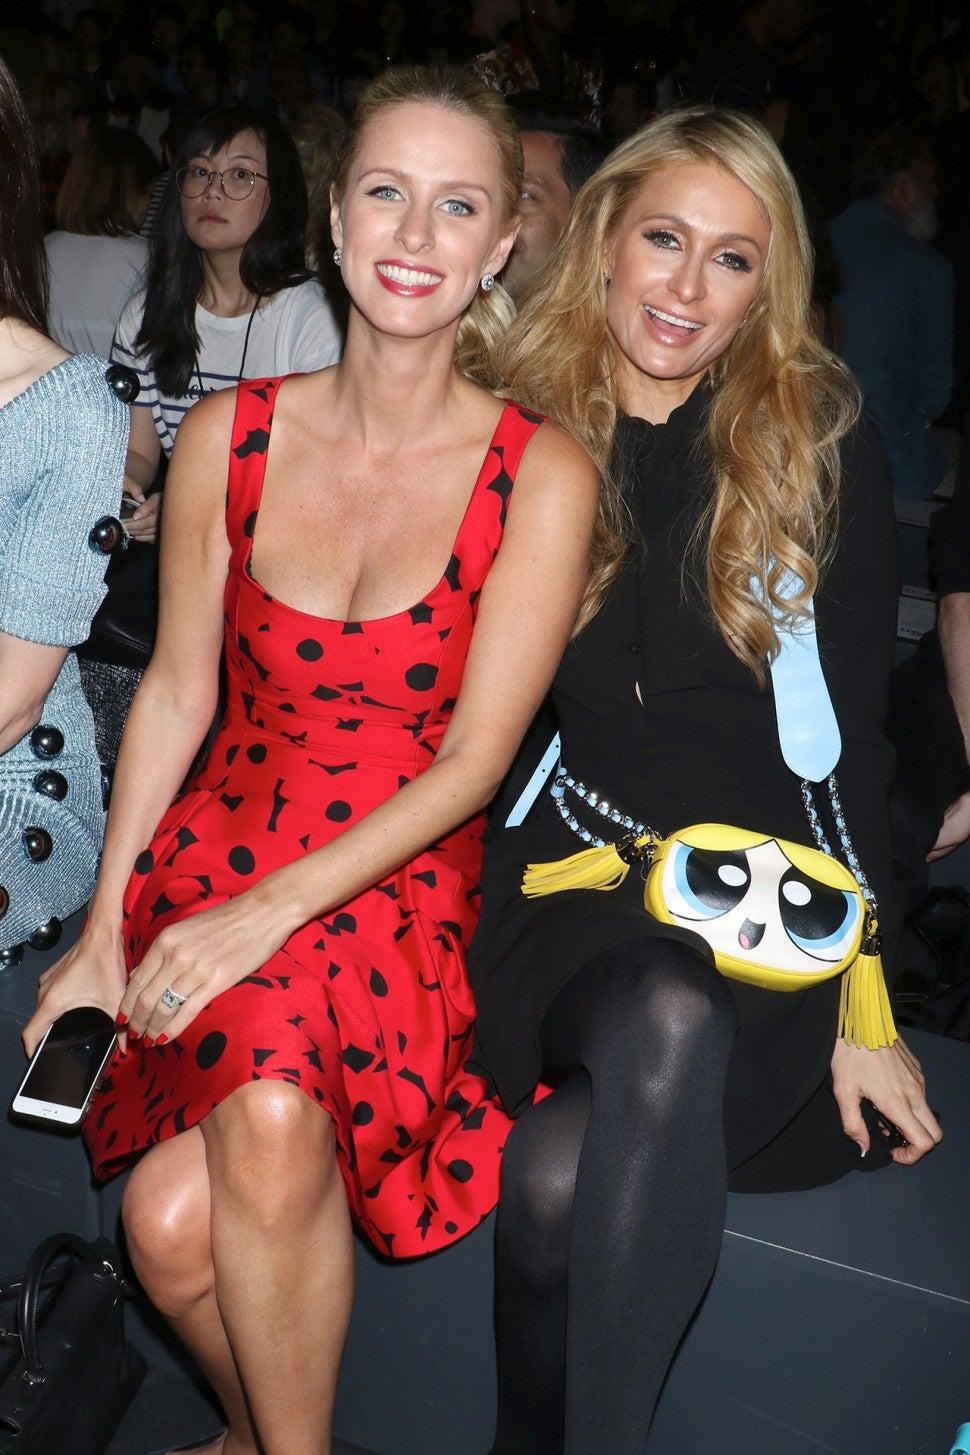 hilton paris nicky sisters adorable etonline shutterstock nyfw outing unite sister rex styles tonight artigo